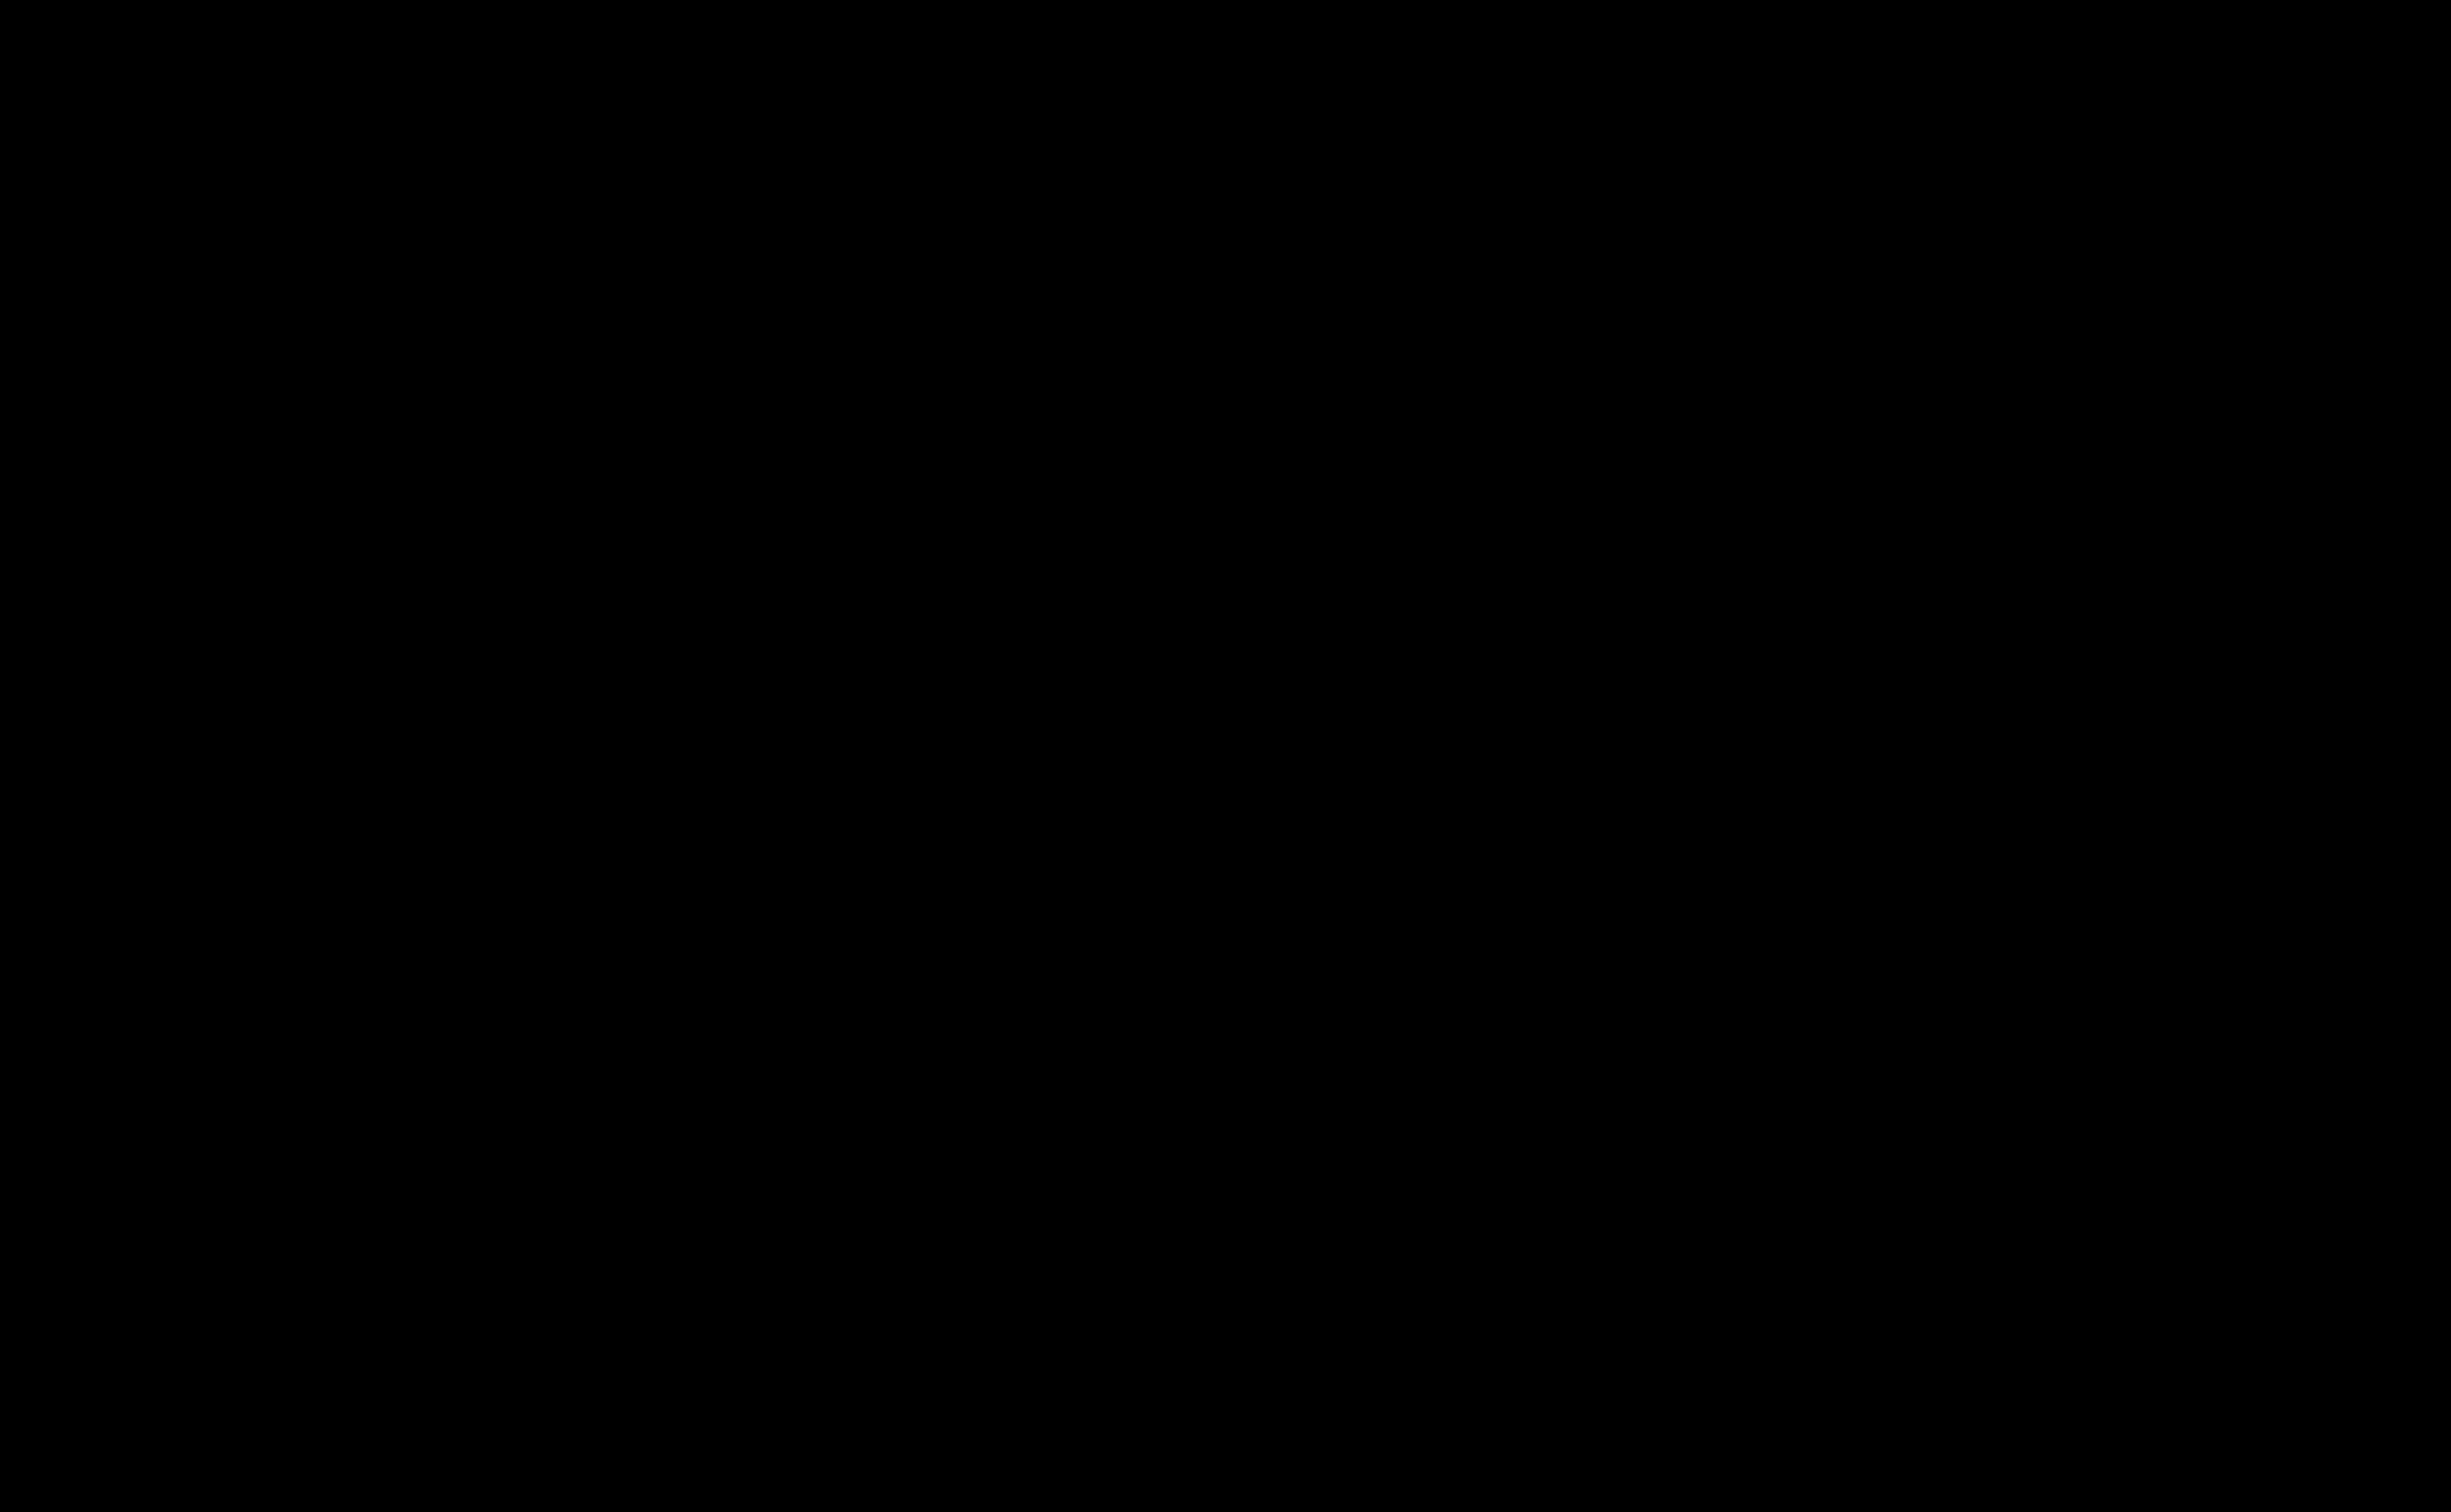 KM2018